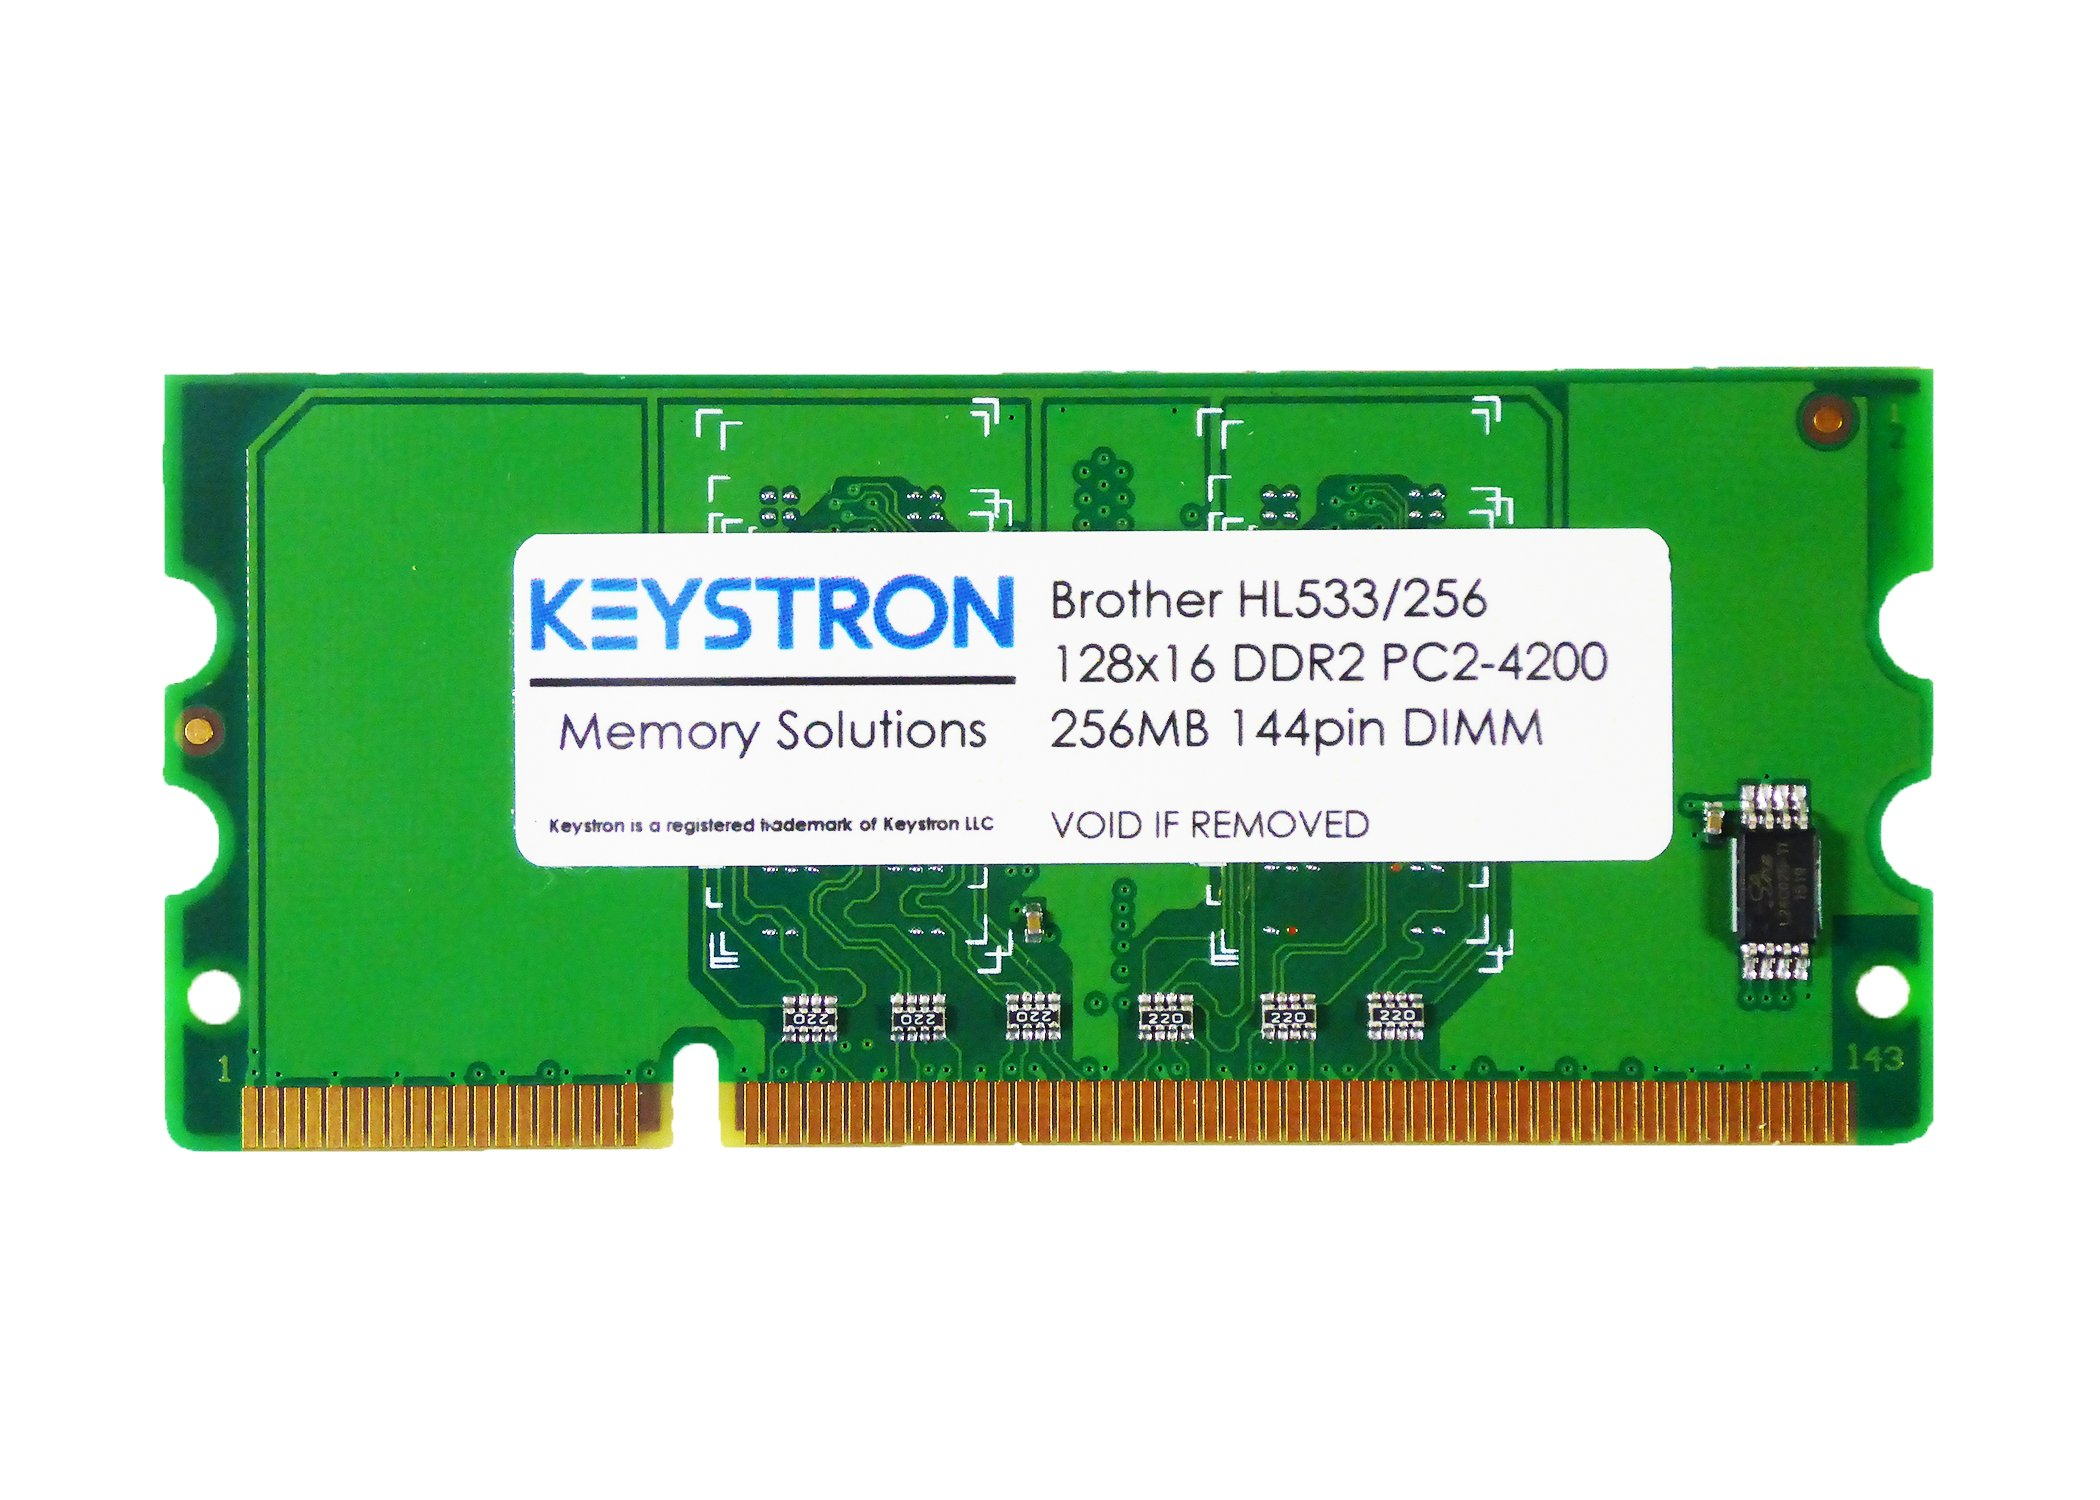 Keystron 256MB DDR2 144pin 16bit Memory Upgrade for Brother Laser Printer MFC-L8600CDW, MFC-L8850CDW, MFC-L9550CDW